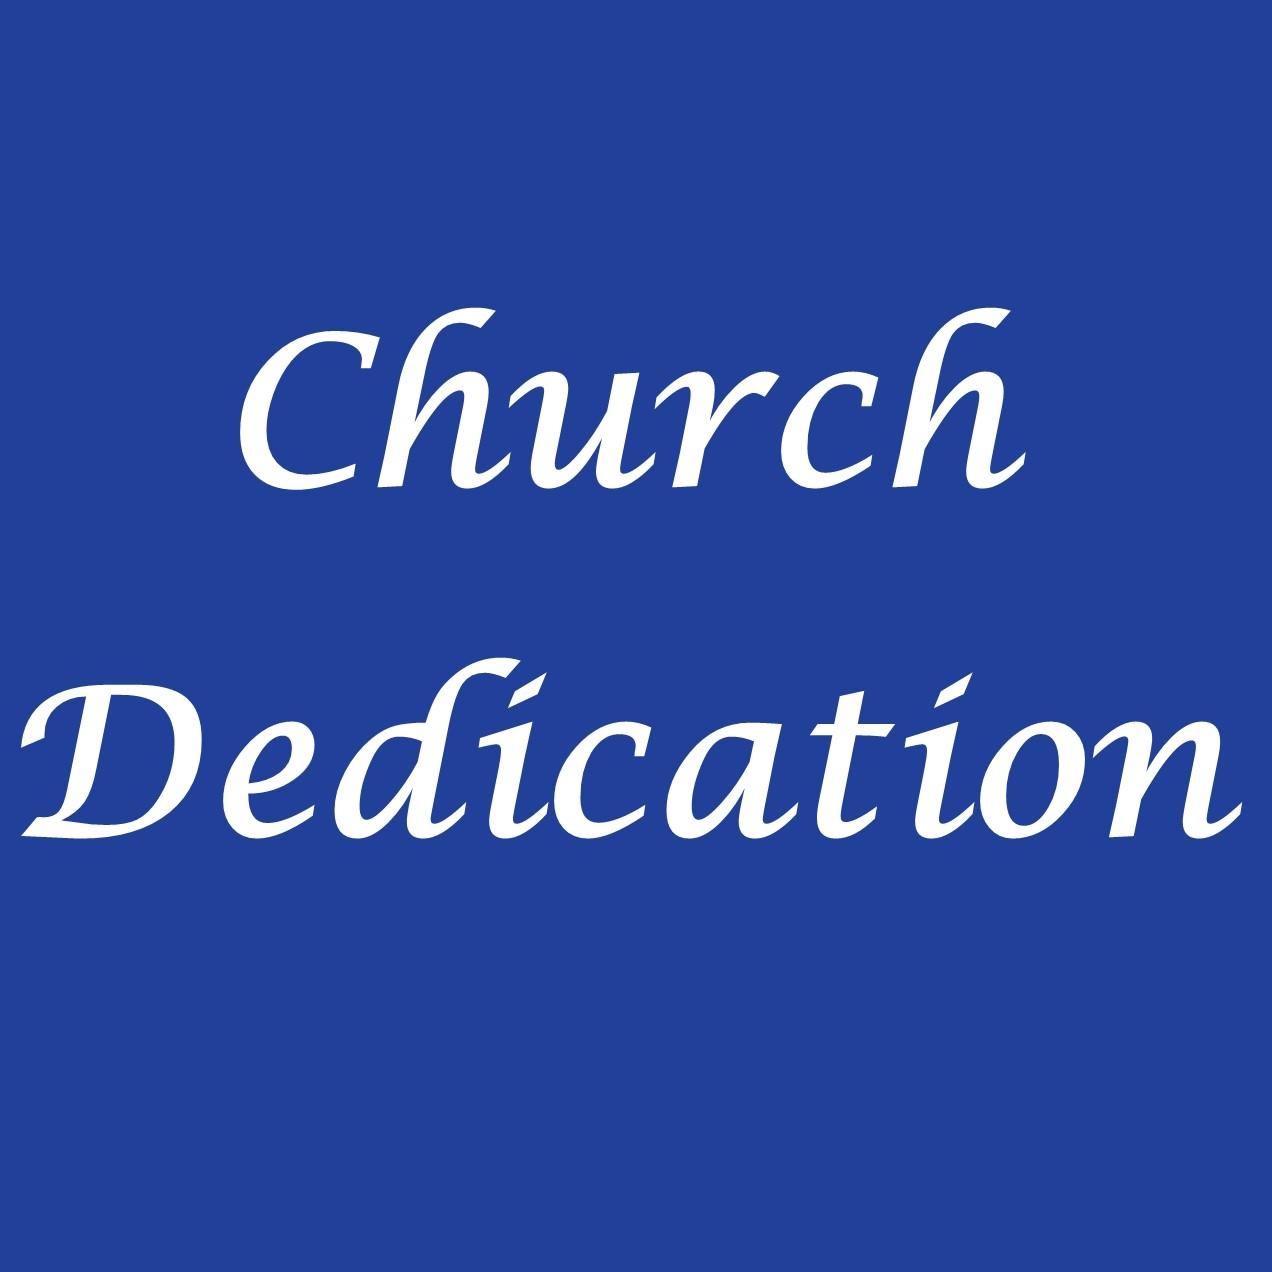 Peace Lutheran Church (Aiken, South Carolina)Sermons from Peace in